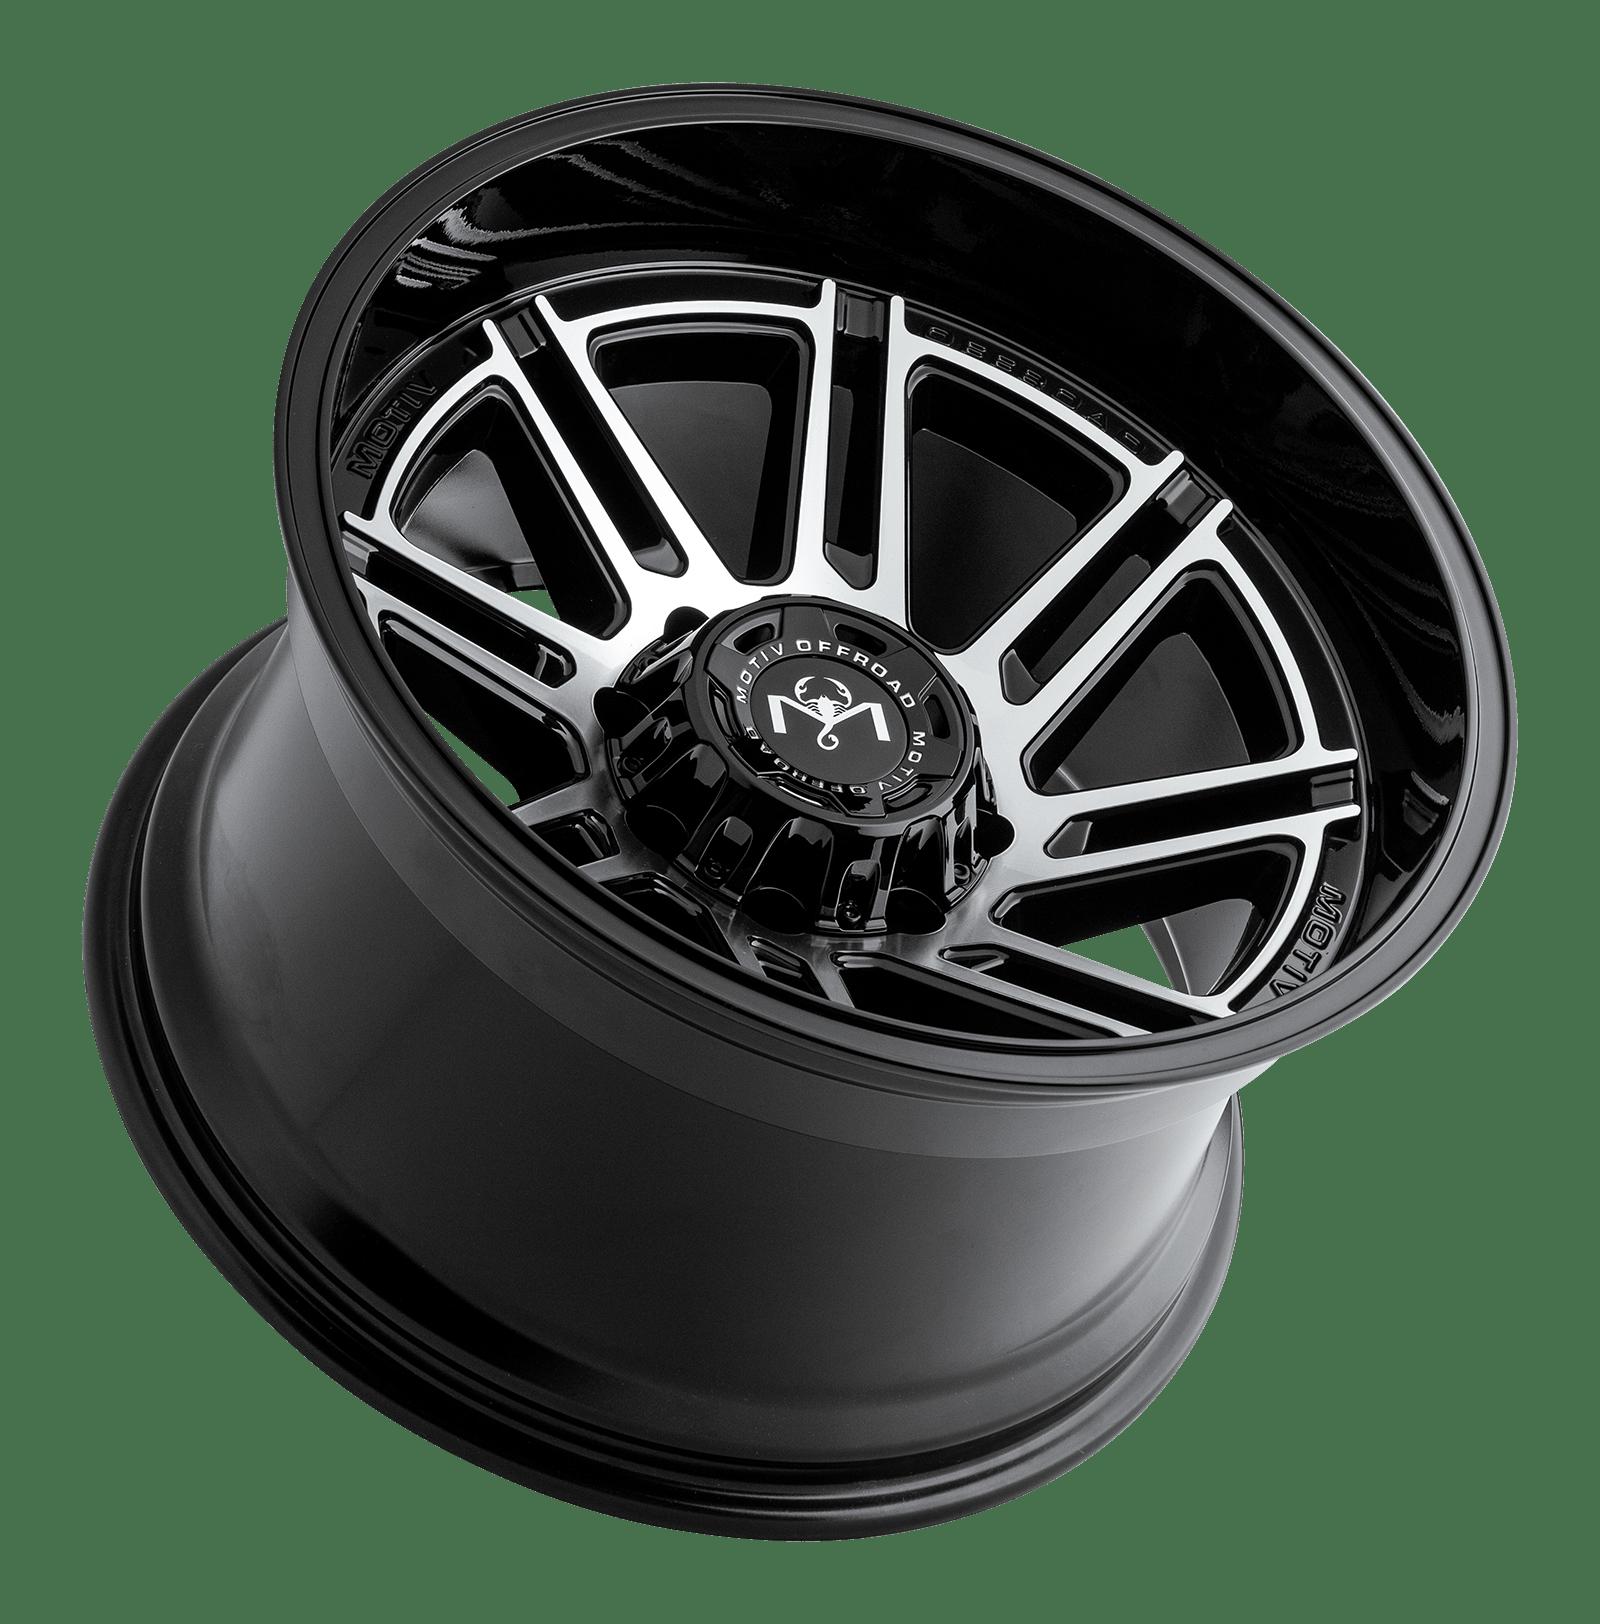 motiv wheels off road 425bm wheels rims gloss black milled